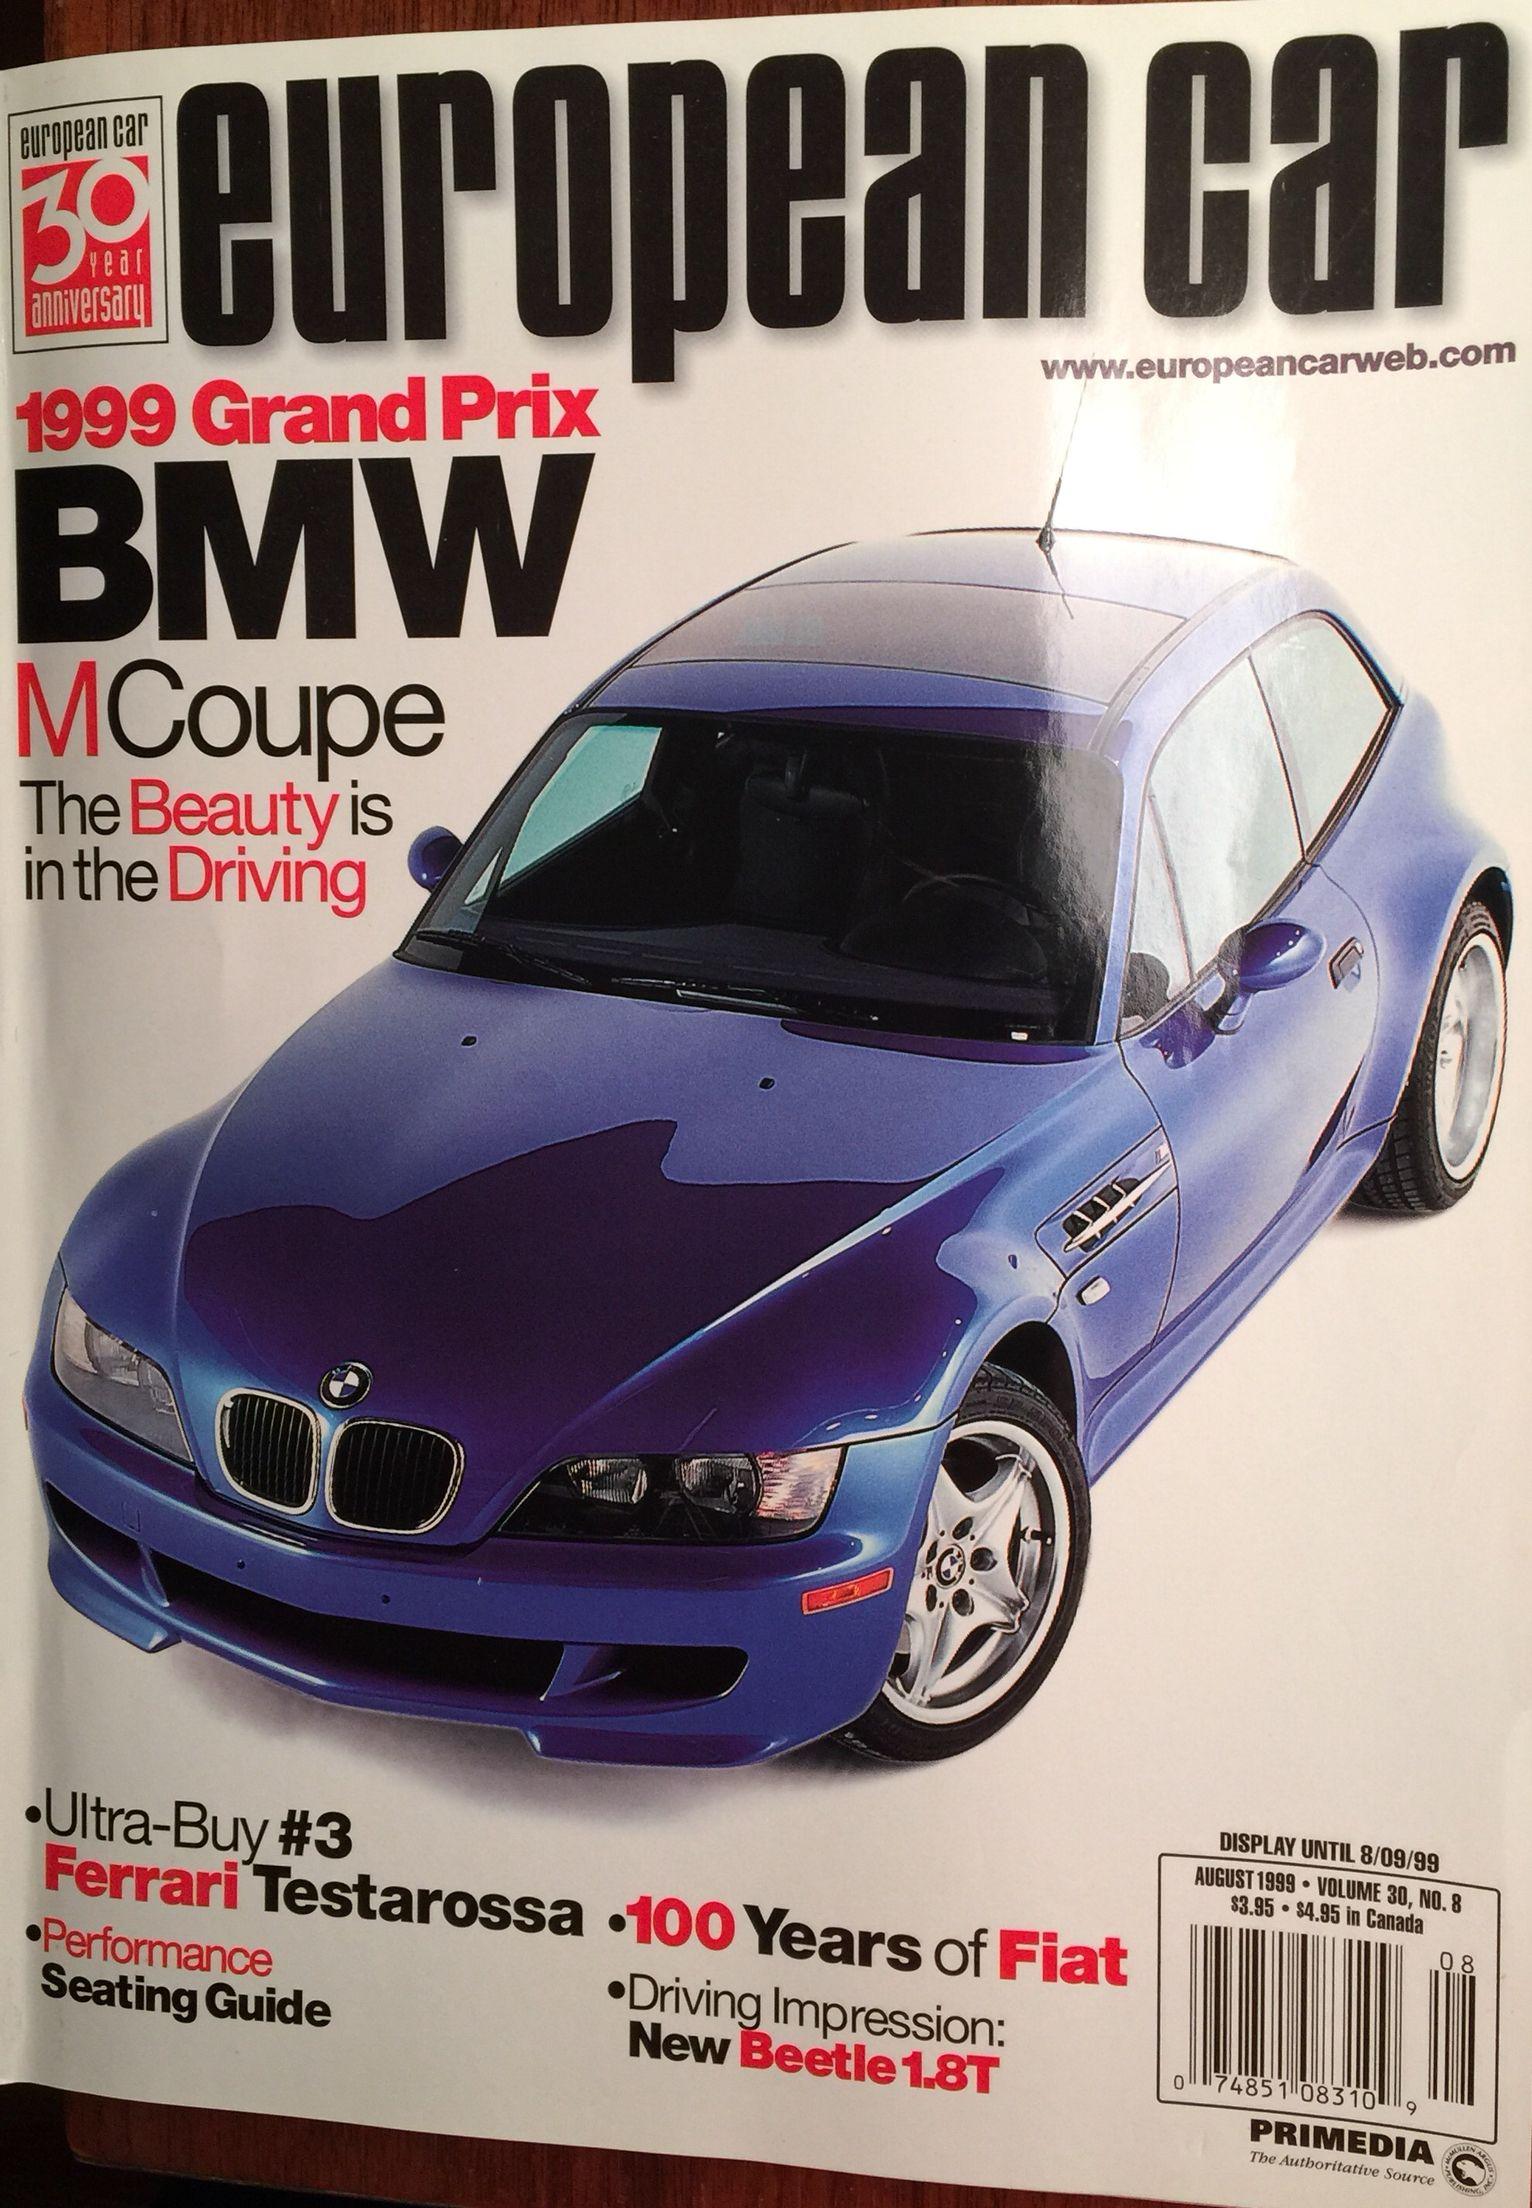 99 Cover Of European Car Magazine Featuring Their Choice For Car Of